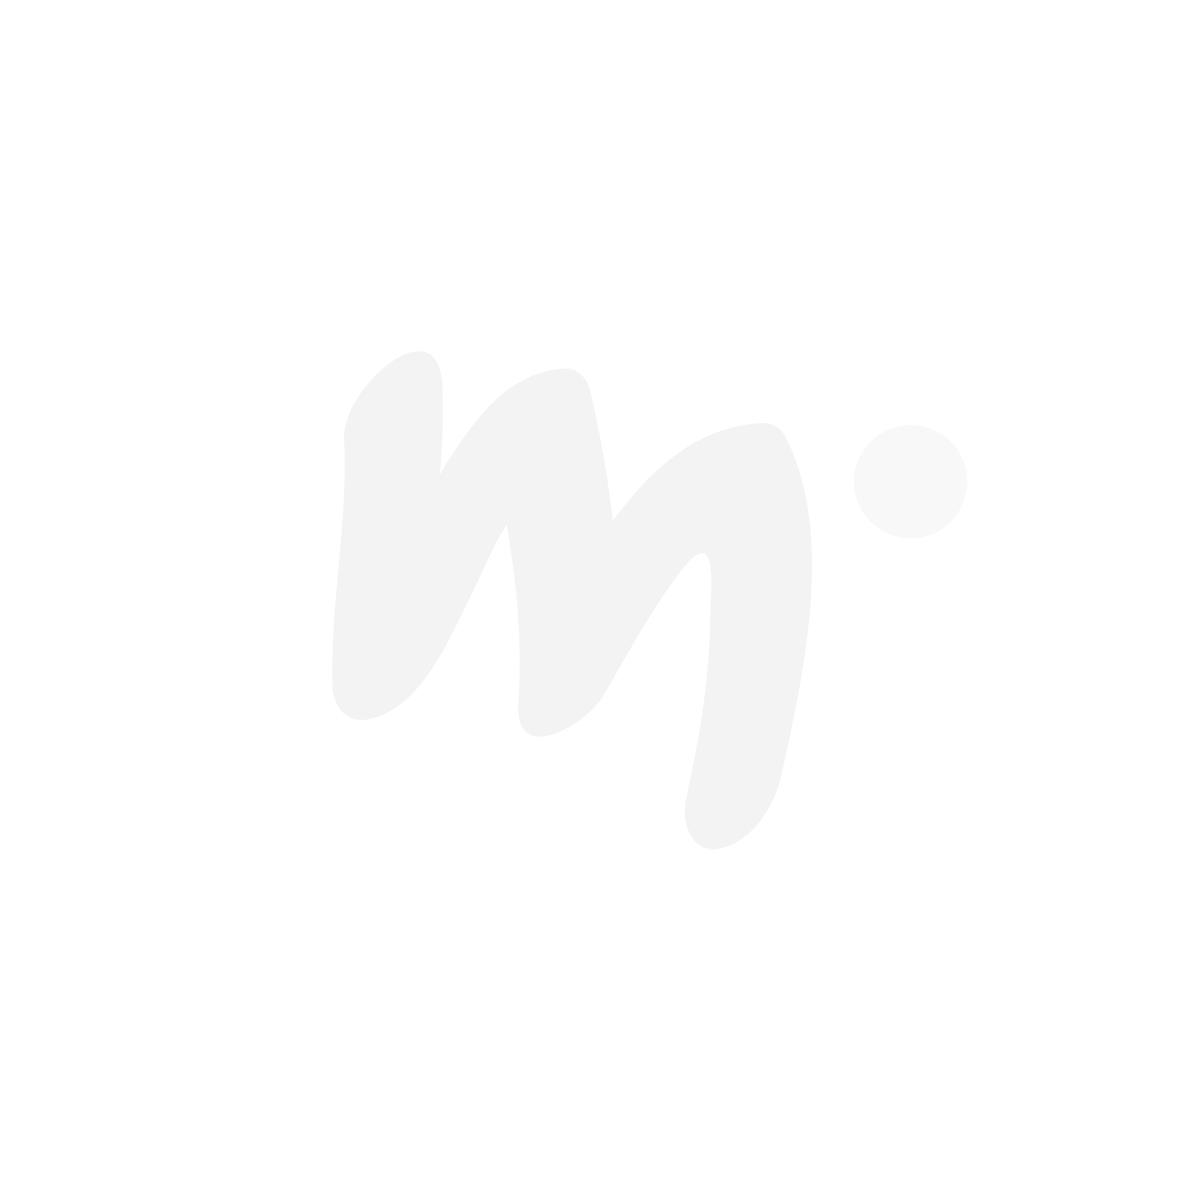 Peppi Pitkätossu Huvikummussa-mekko hihaton